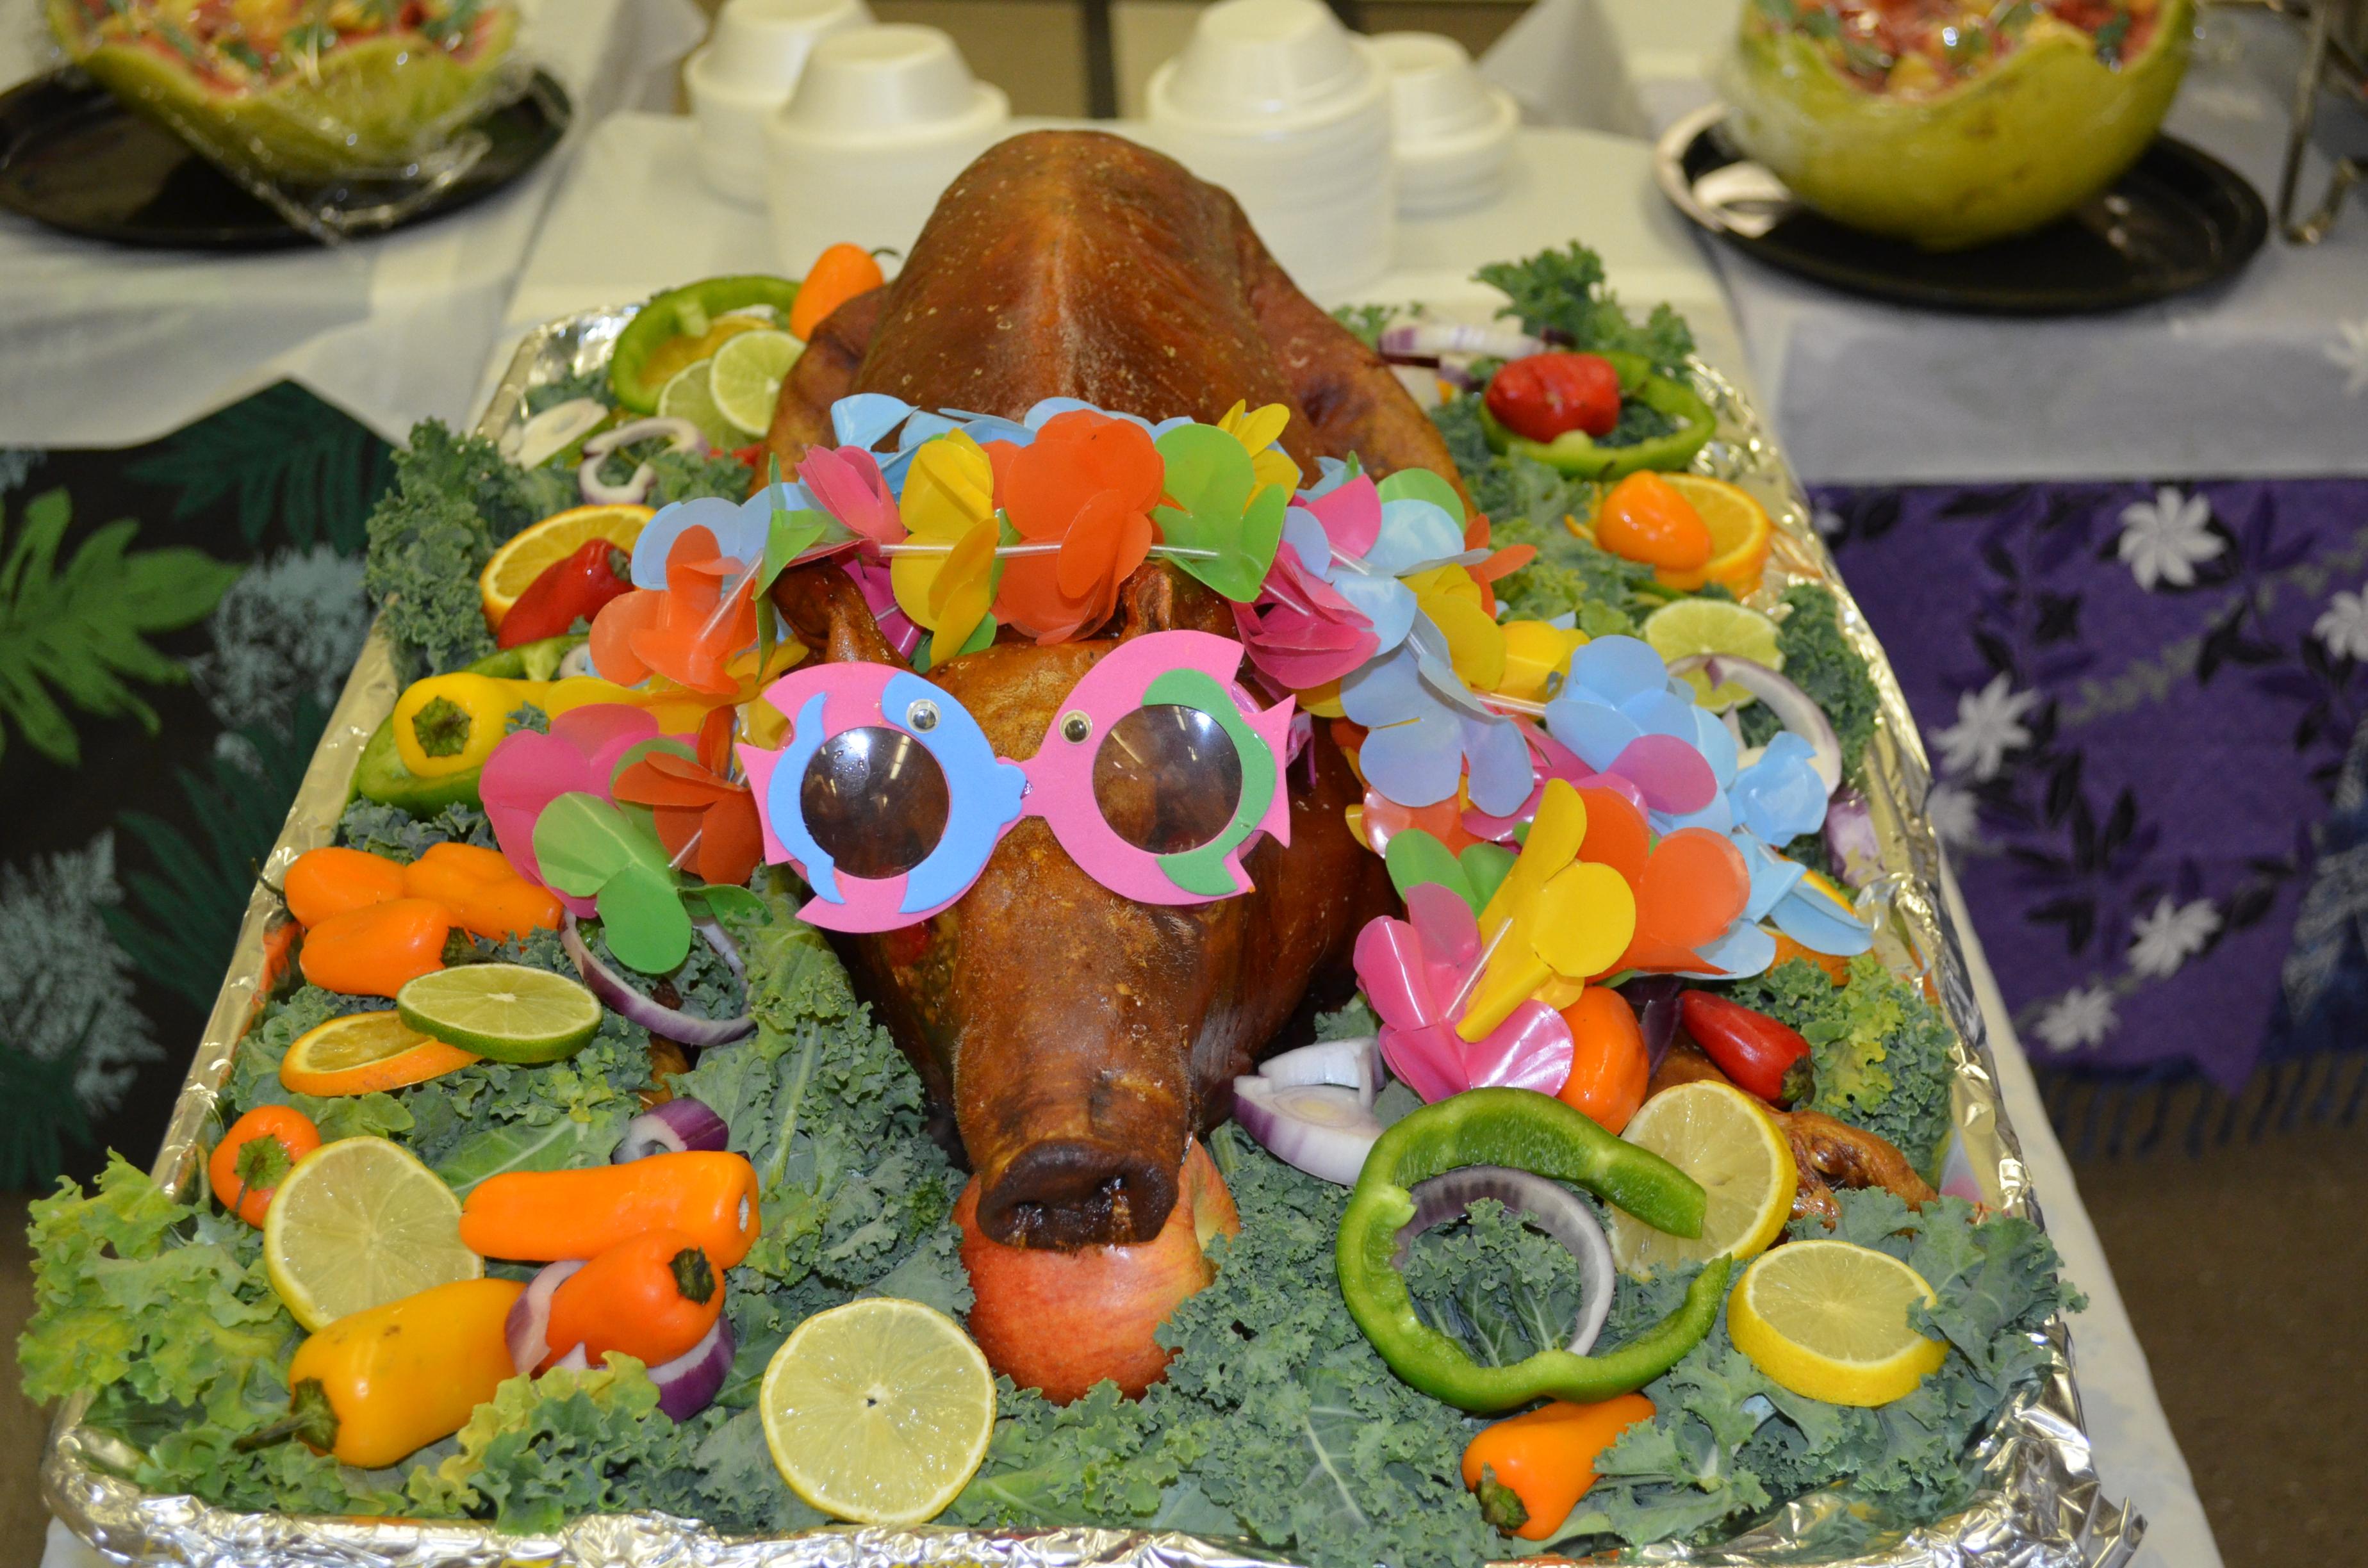 Elizabeth Creatively Used The Hawaiian Decorations